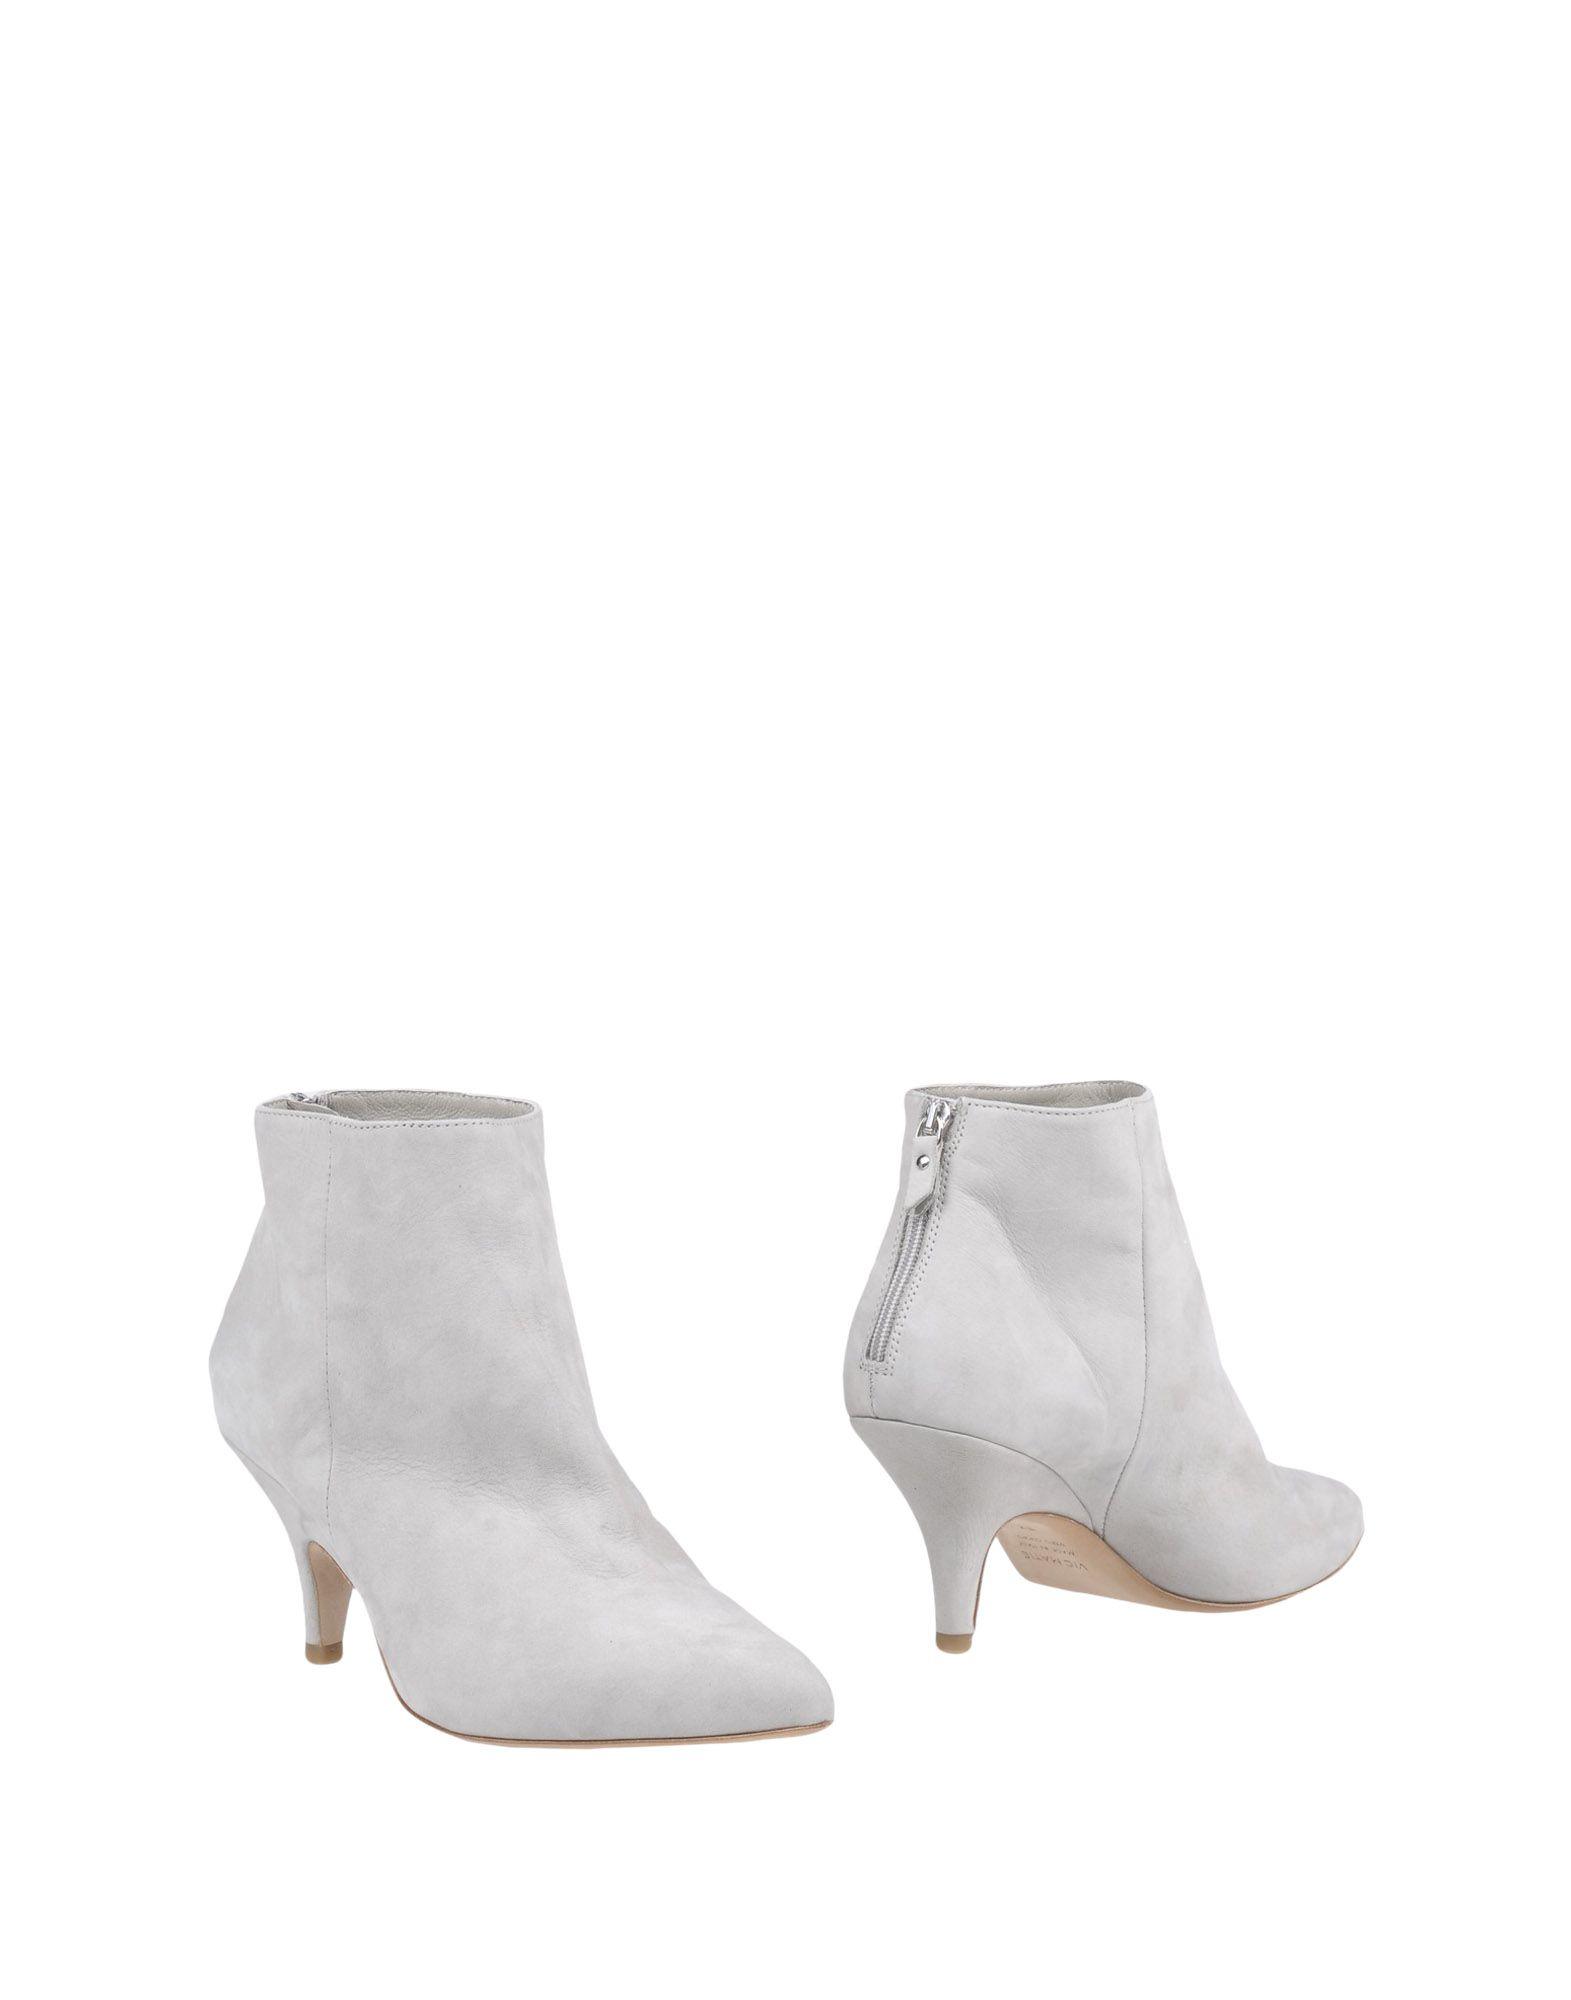 Vic 11423700EX Matiē Stiefelette Damen  11423700EX Vic Gute Qualität beliebte Schuhe 6591aa